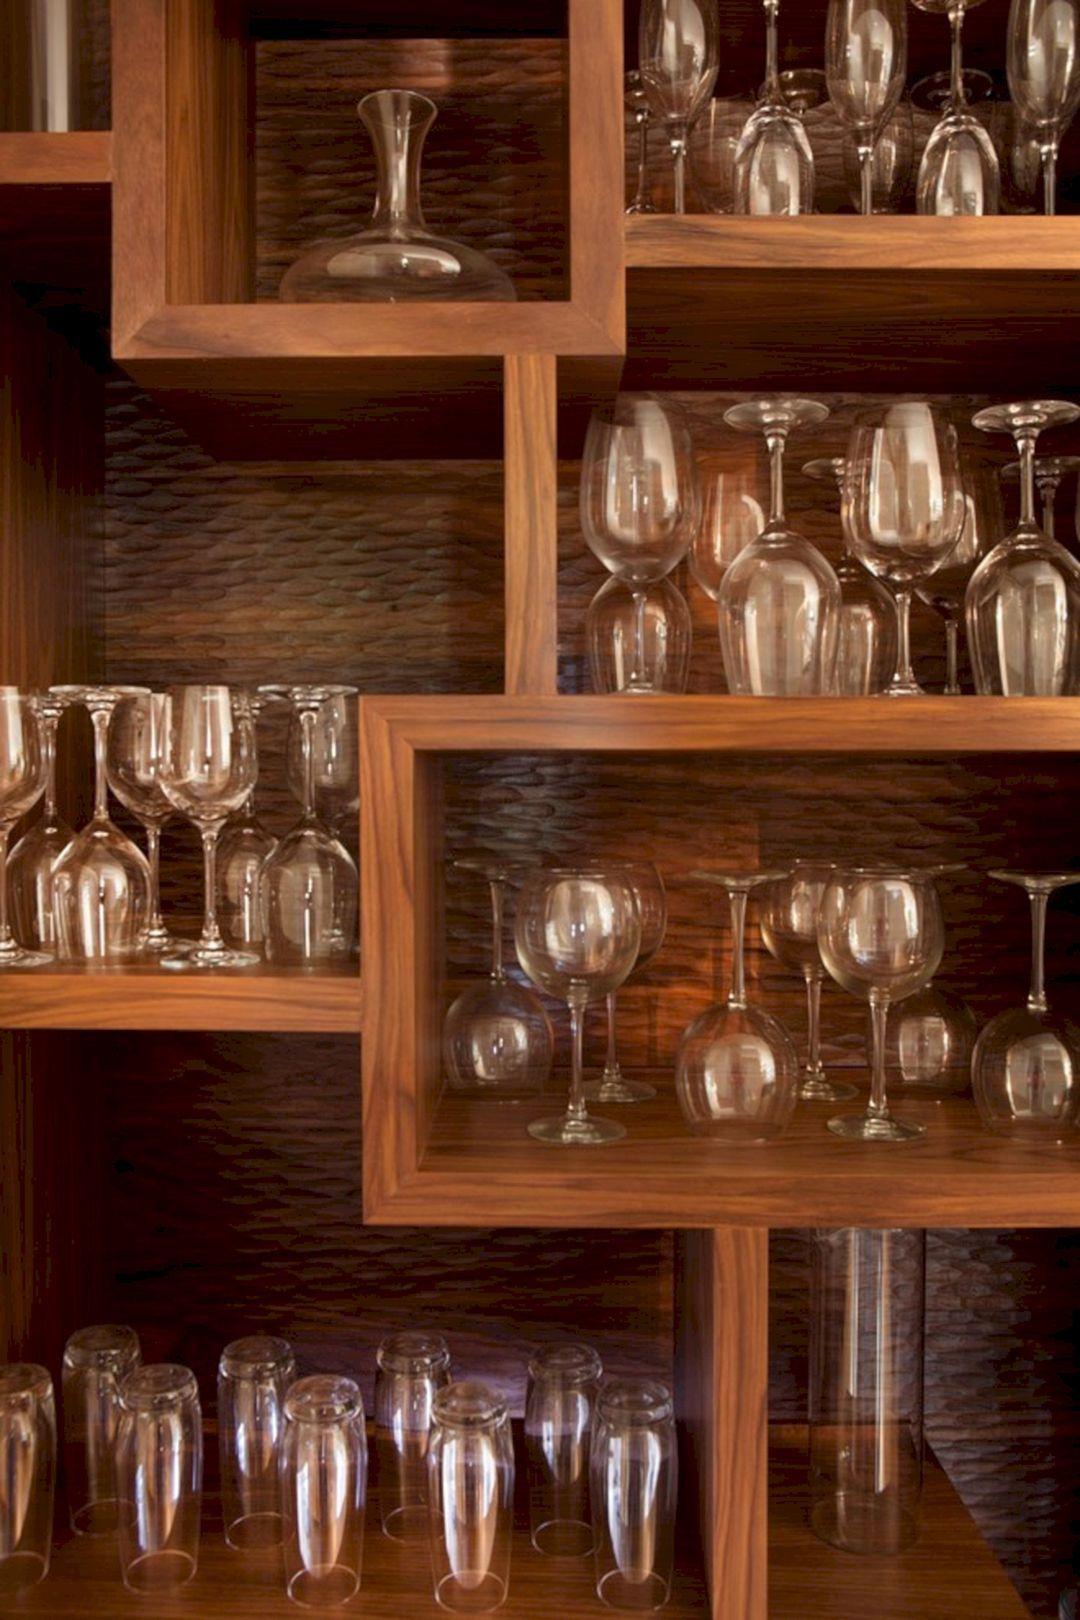 24 Best And Beautiful Wine Storage Ideas For Your Kitchen Wine Glass Storage Basement Bar Design Wine Glass Display